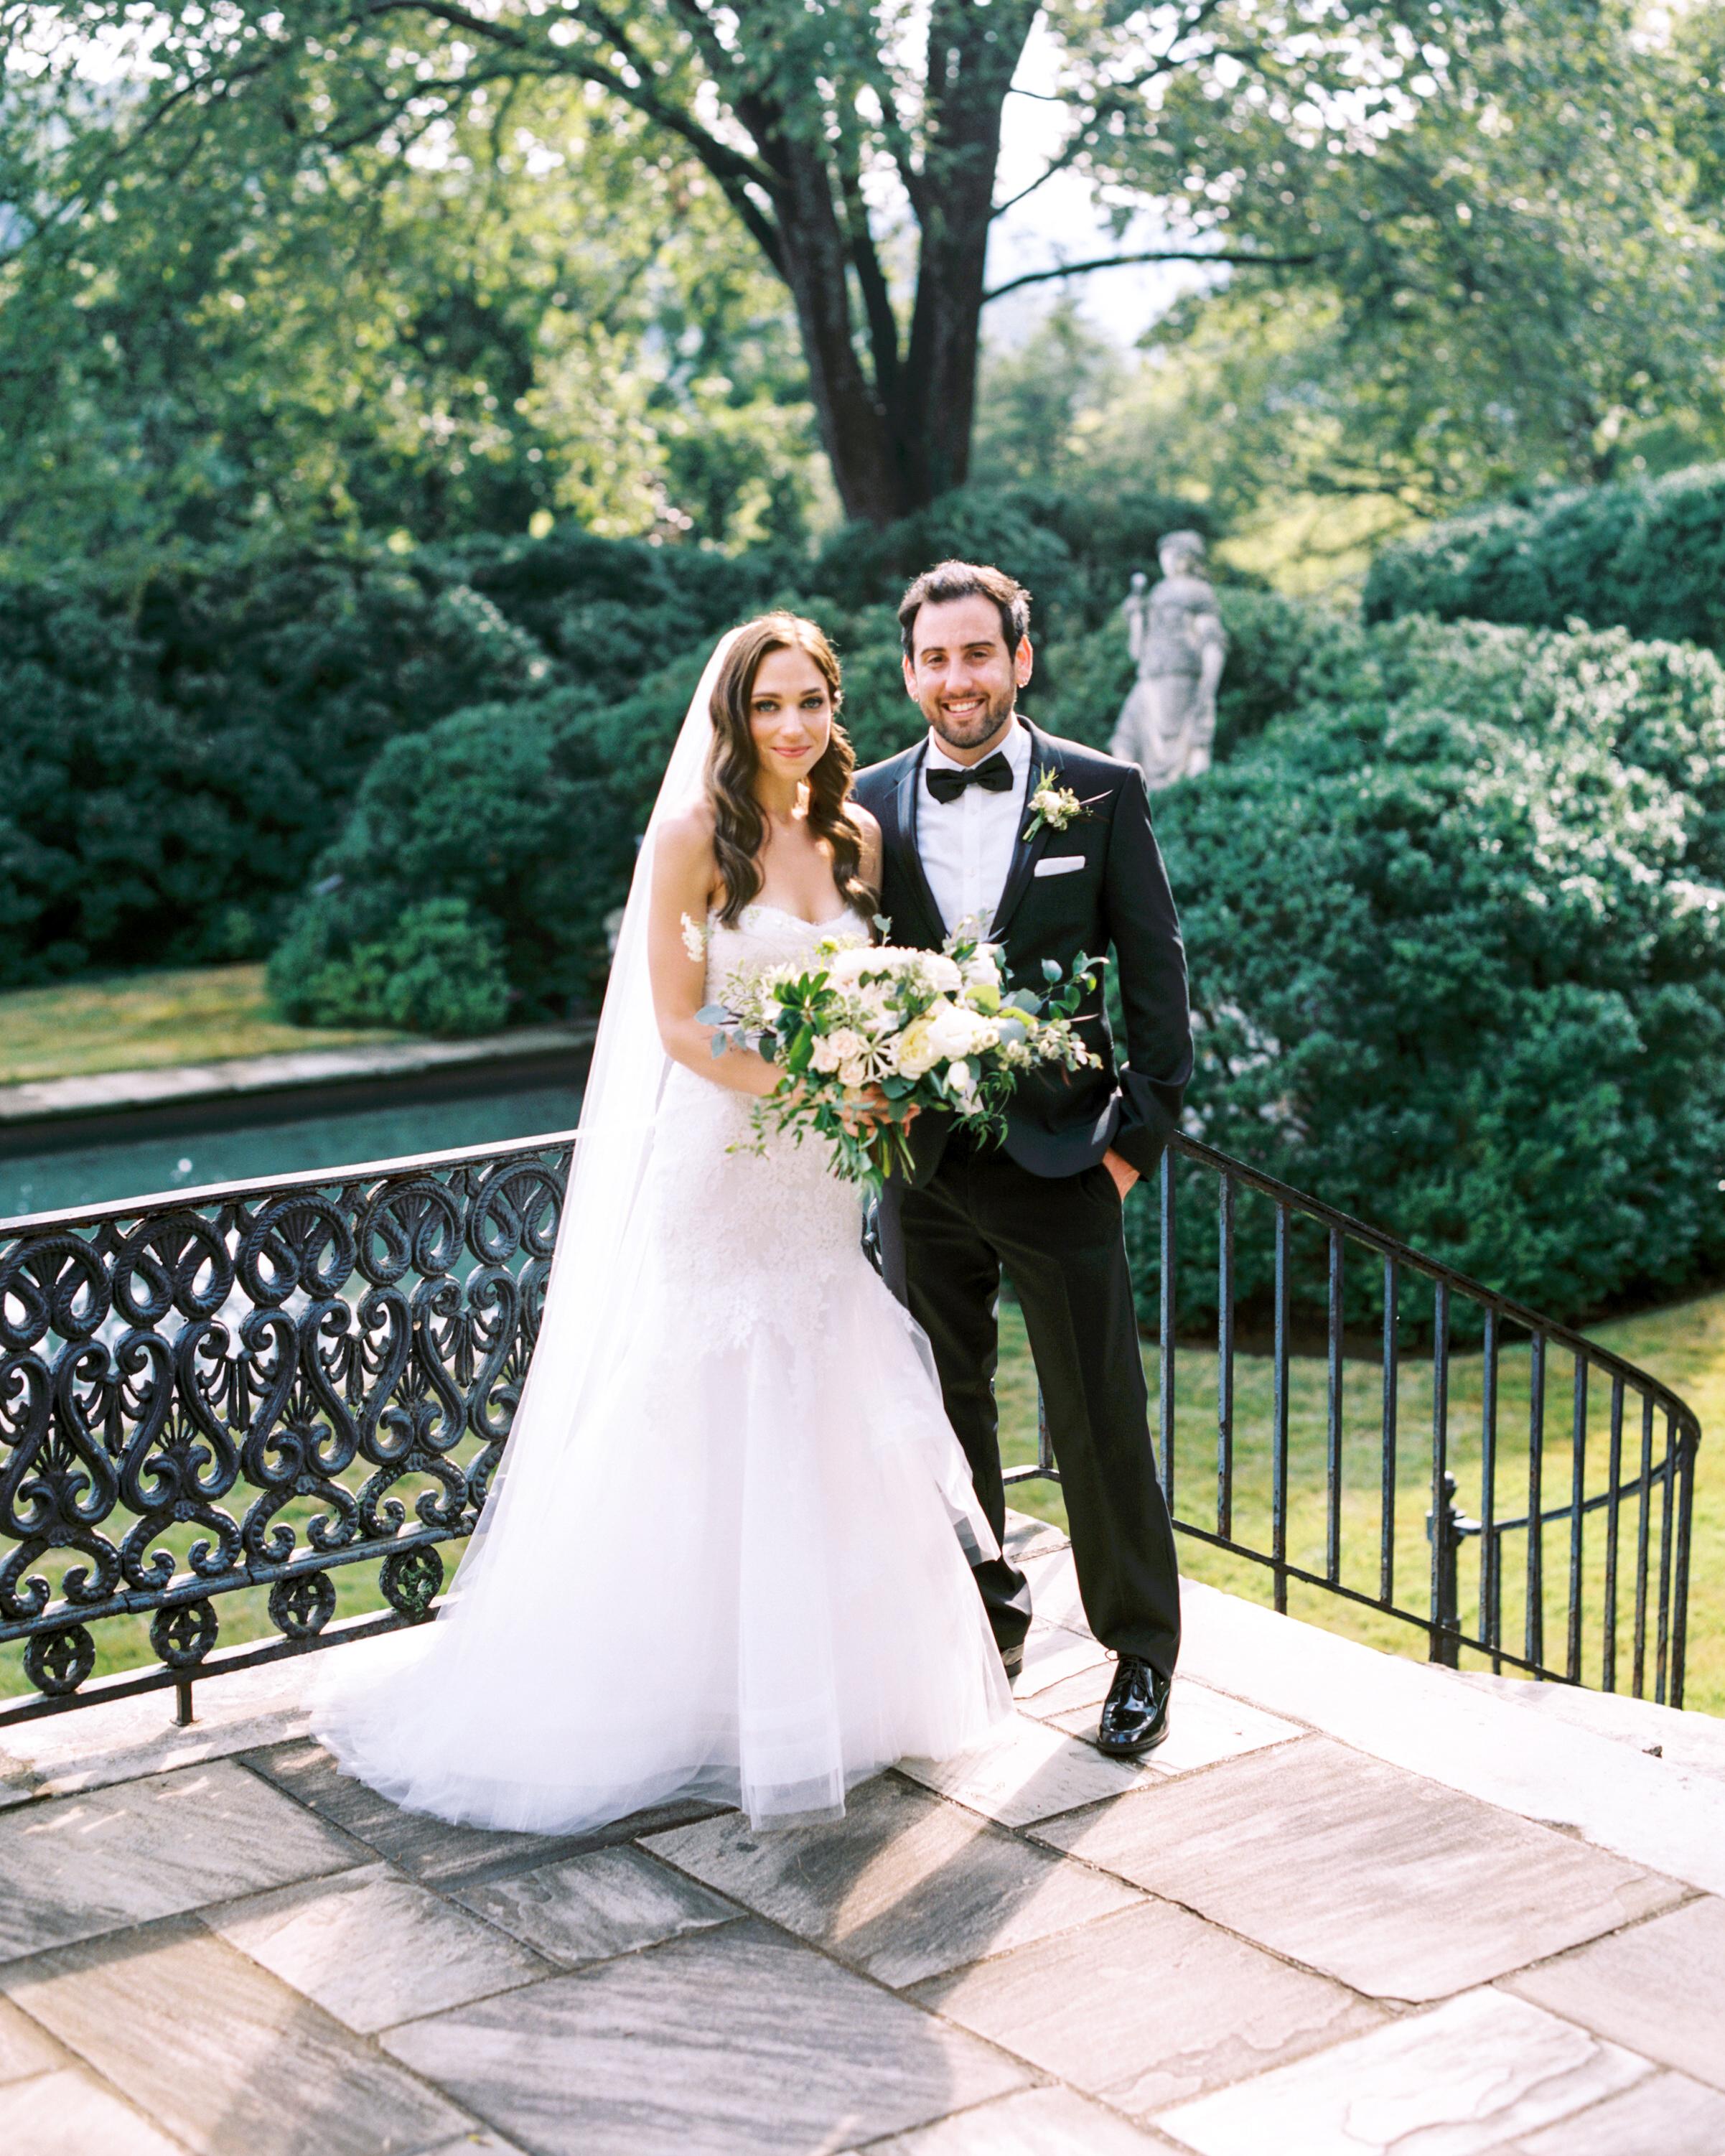 jackie-ross-wedding-couple-028-s111775-0215.jpg